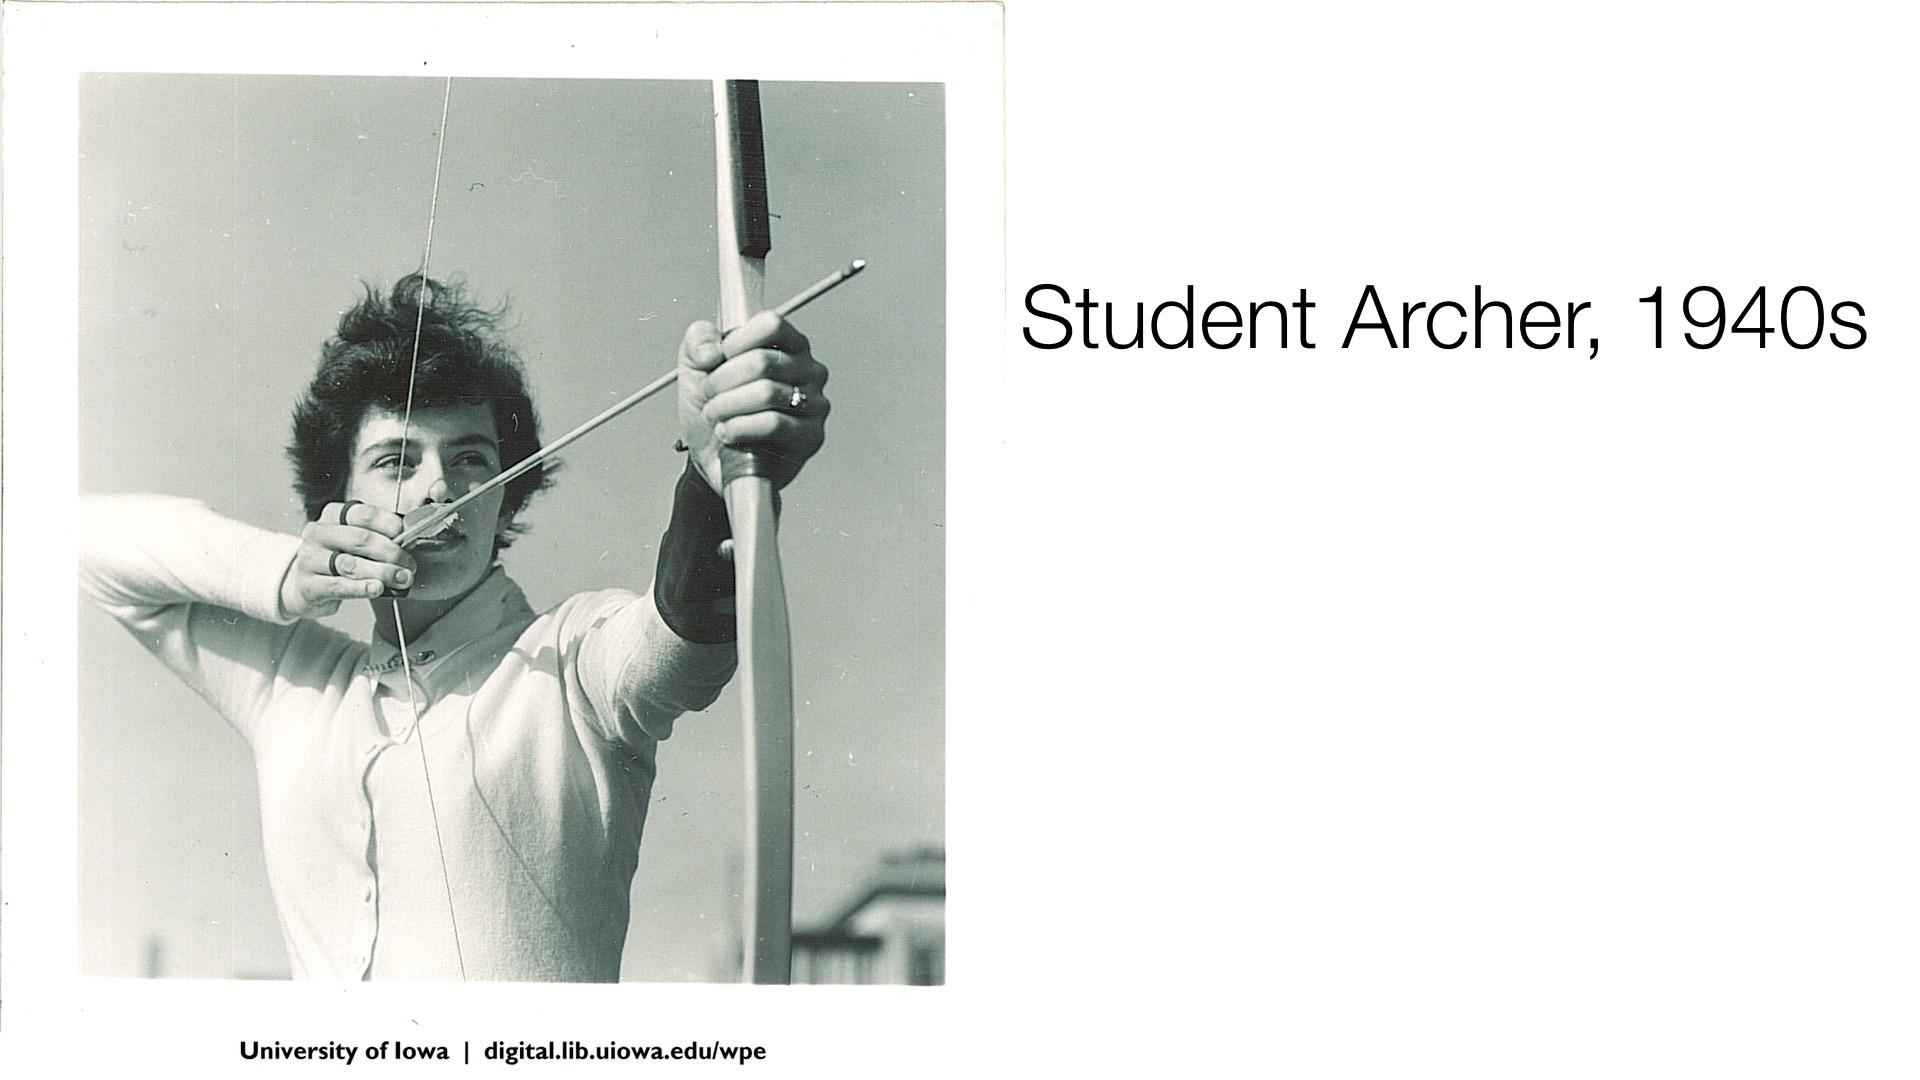 Student Archer, 1940s